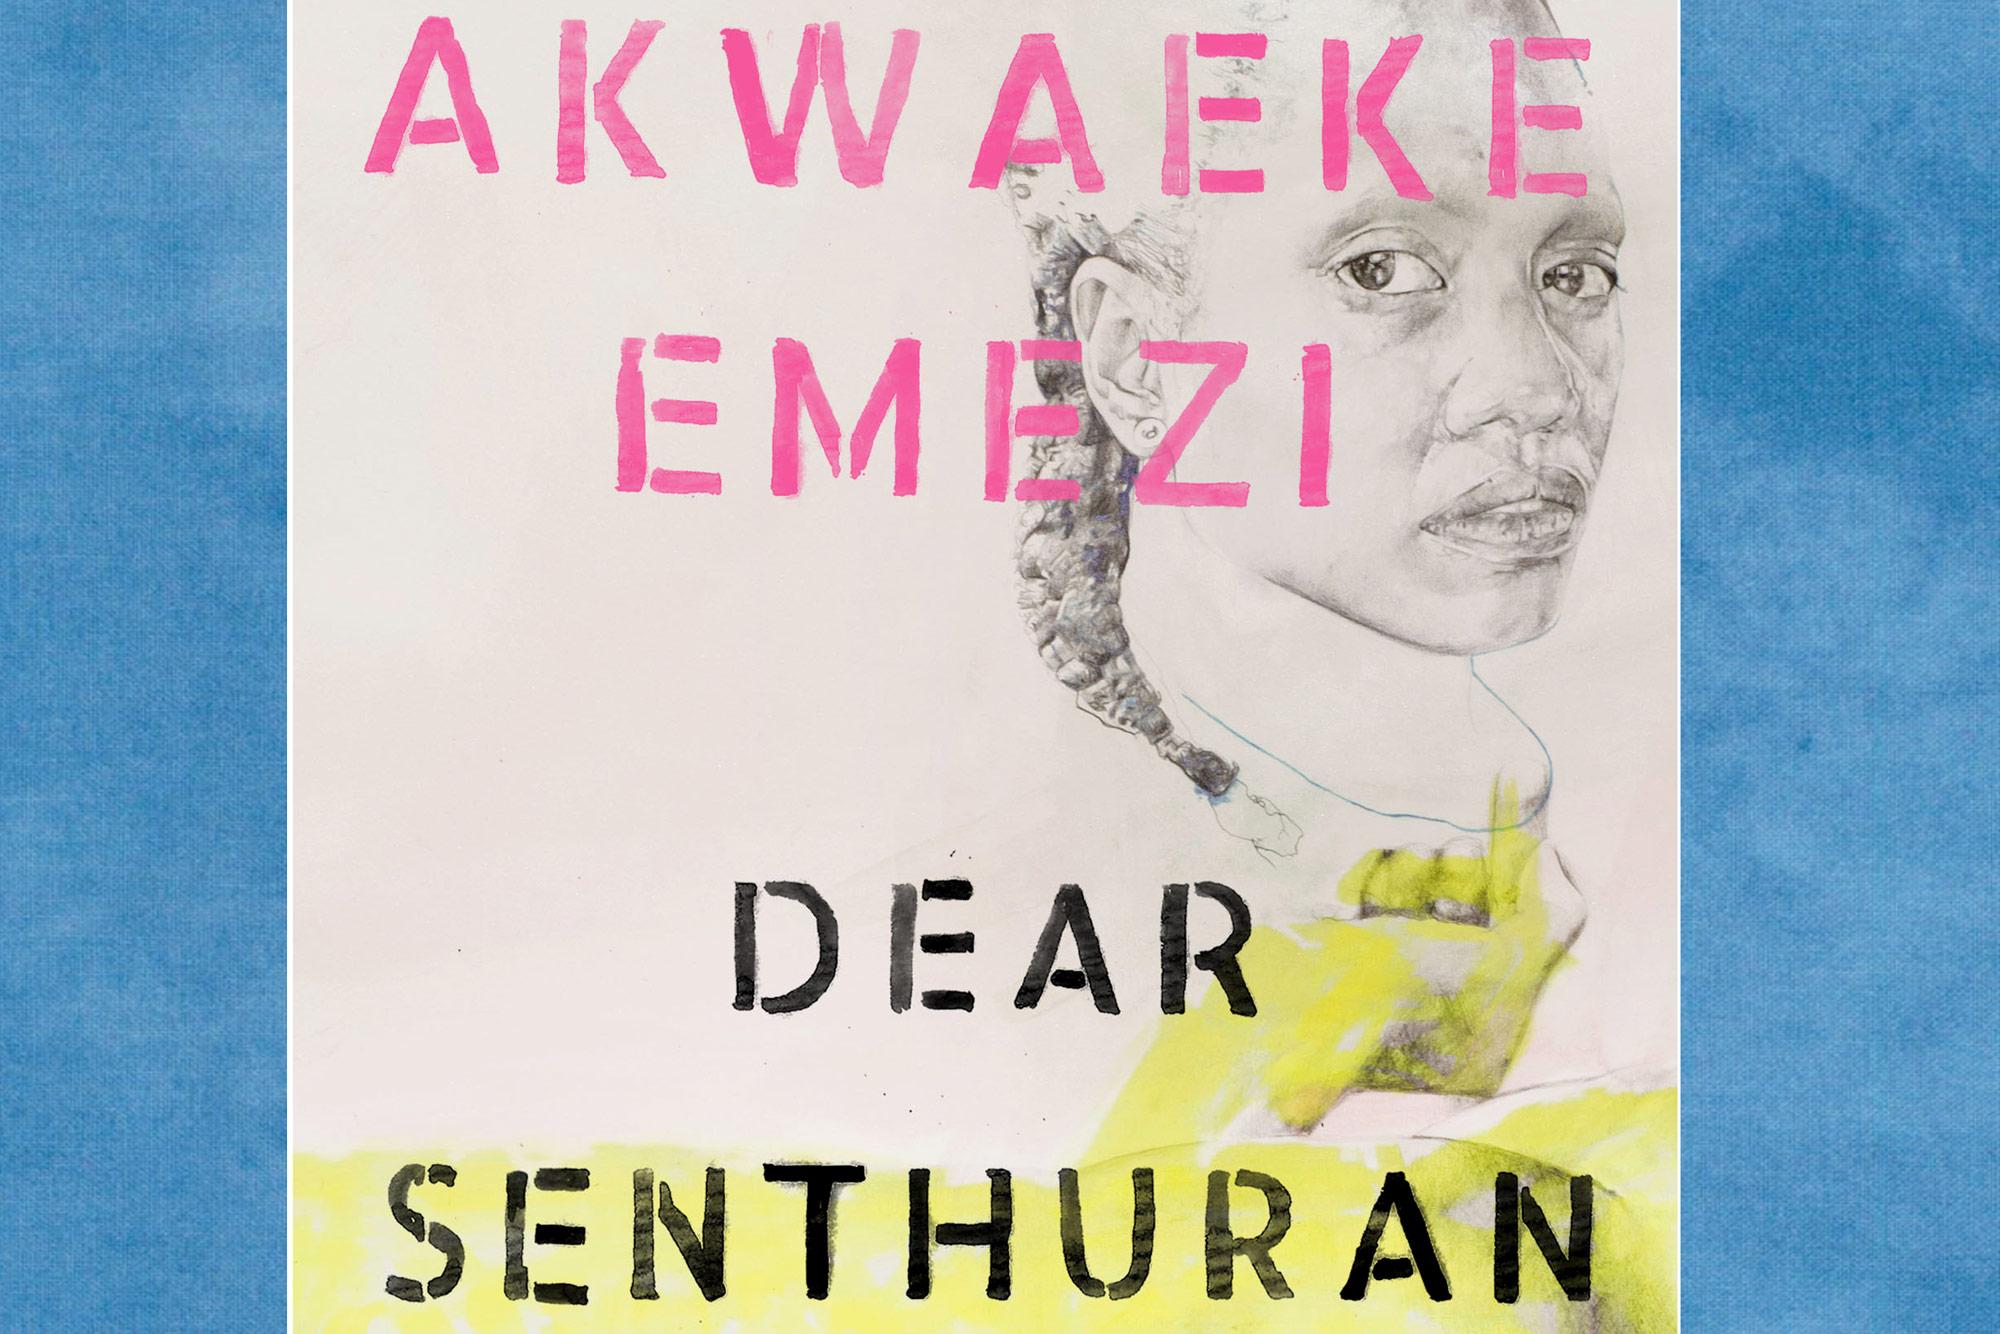 www.newframe.com: Book Review | 'Dear Senthuran' by Akwaeke Emezi